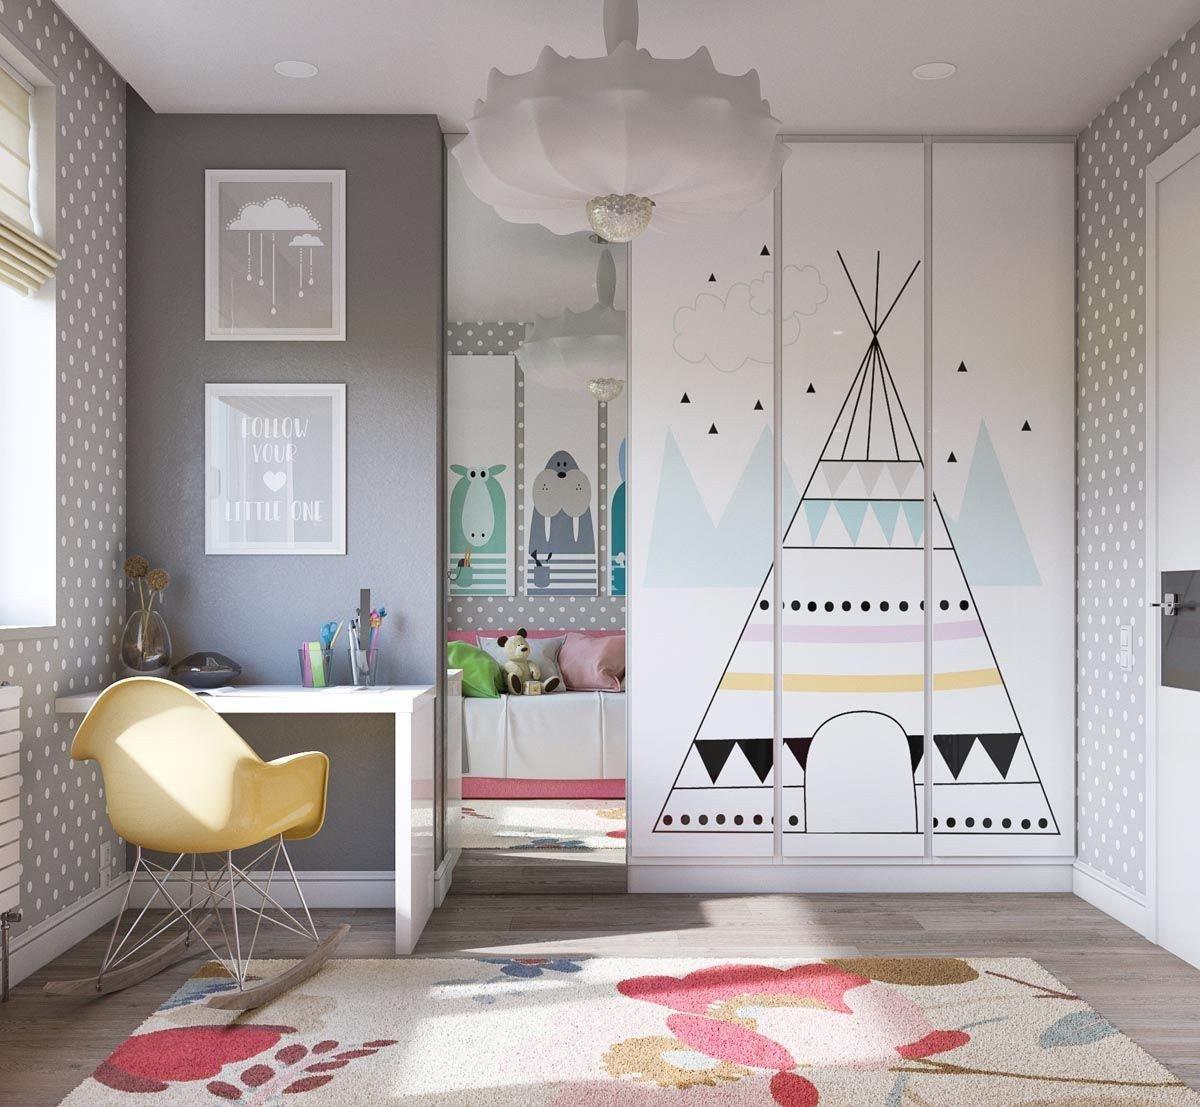 Wallpapers for Girls Bedroom Lovely Pin On Home Room for Kids